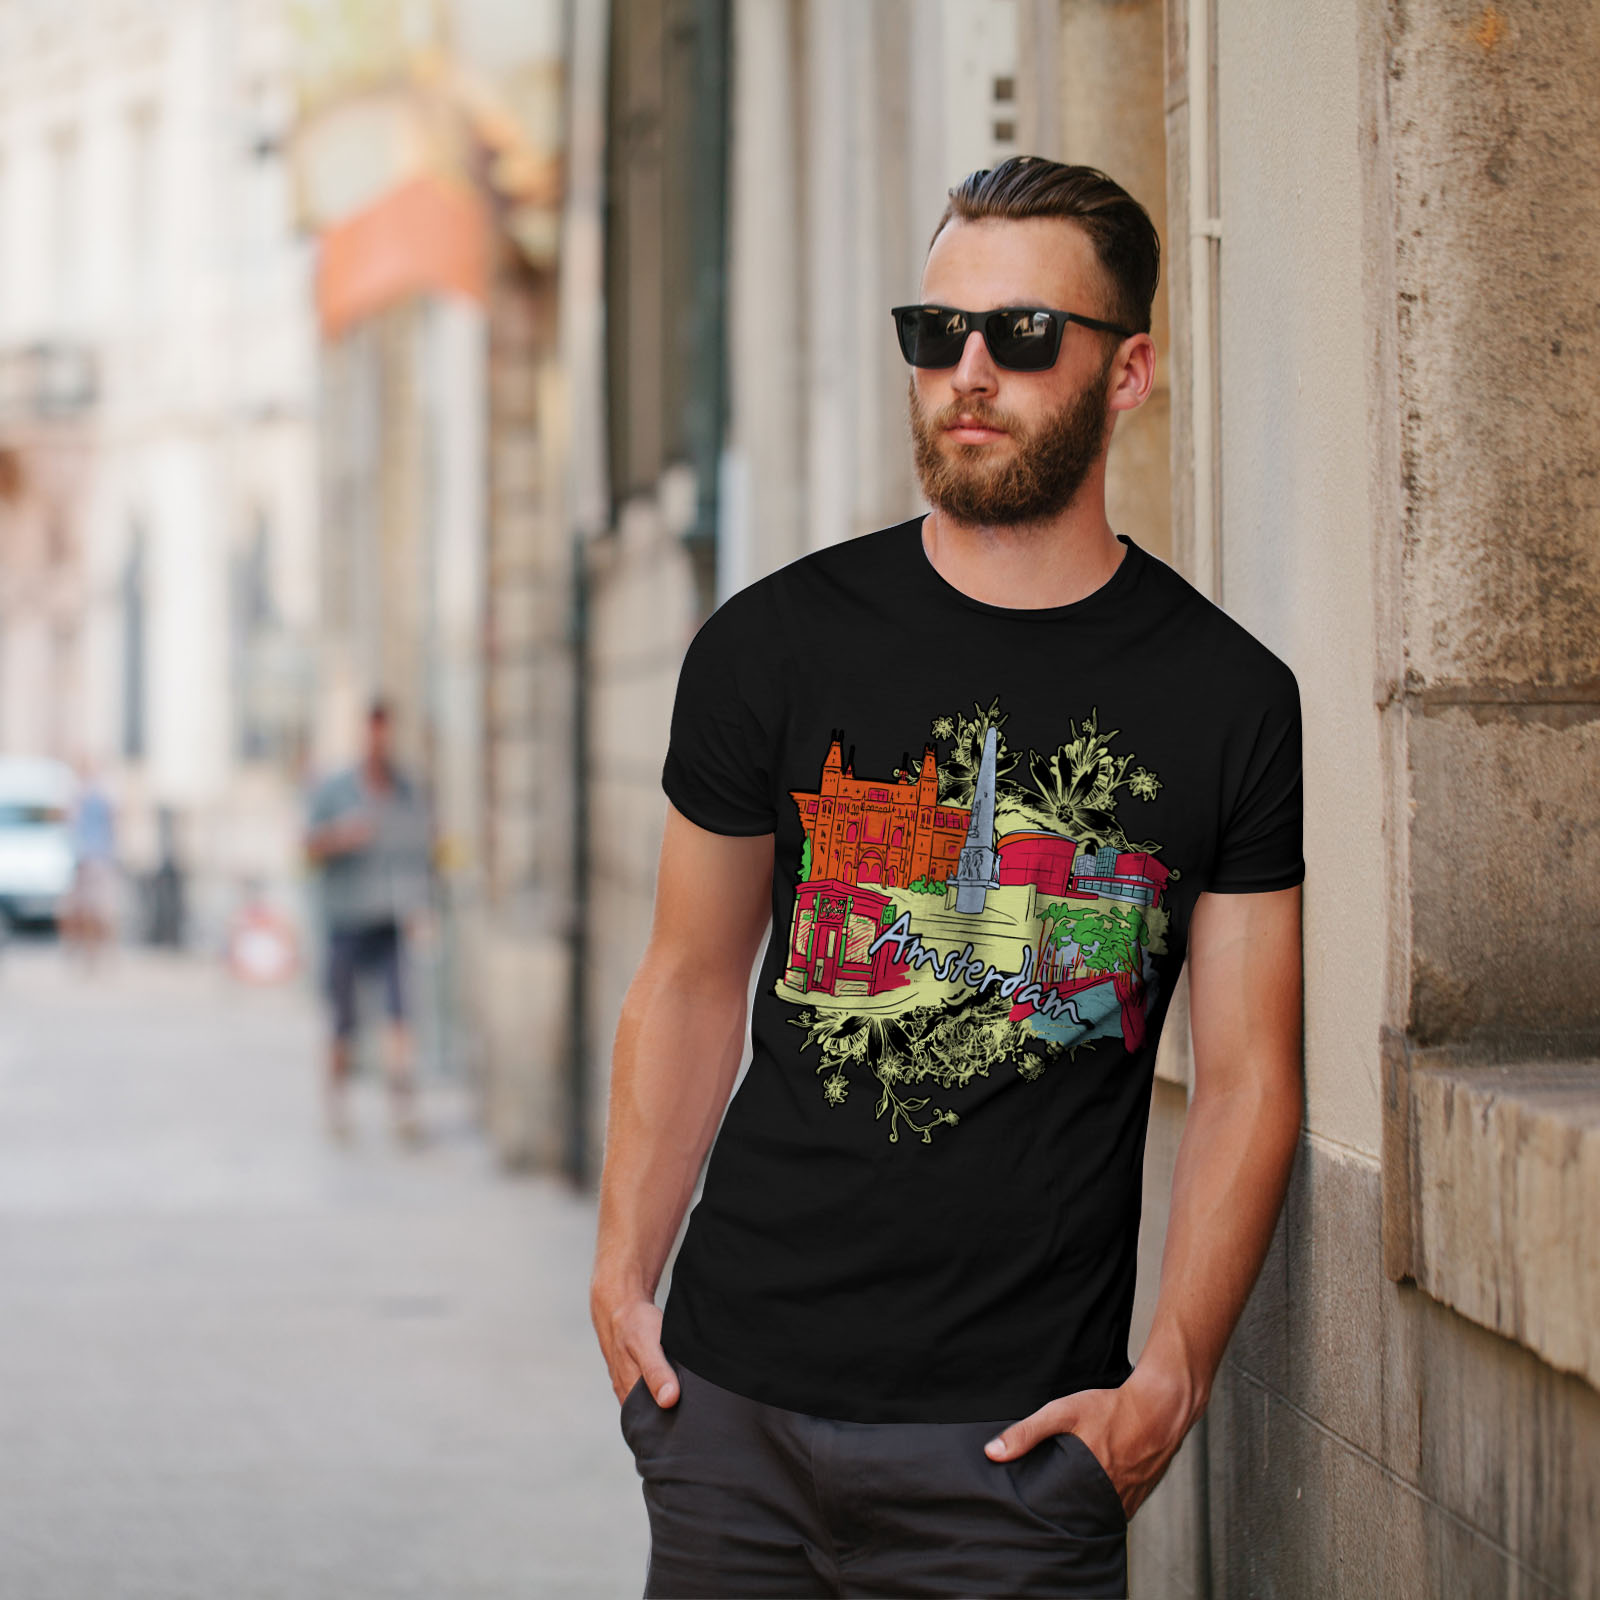 Netherlands Graphic Design Printed Tee Wellcoda 42 Weed Mens T-shirt